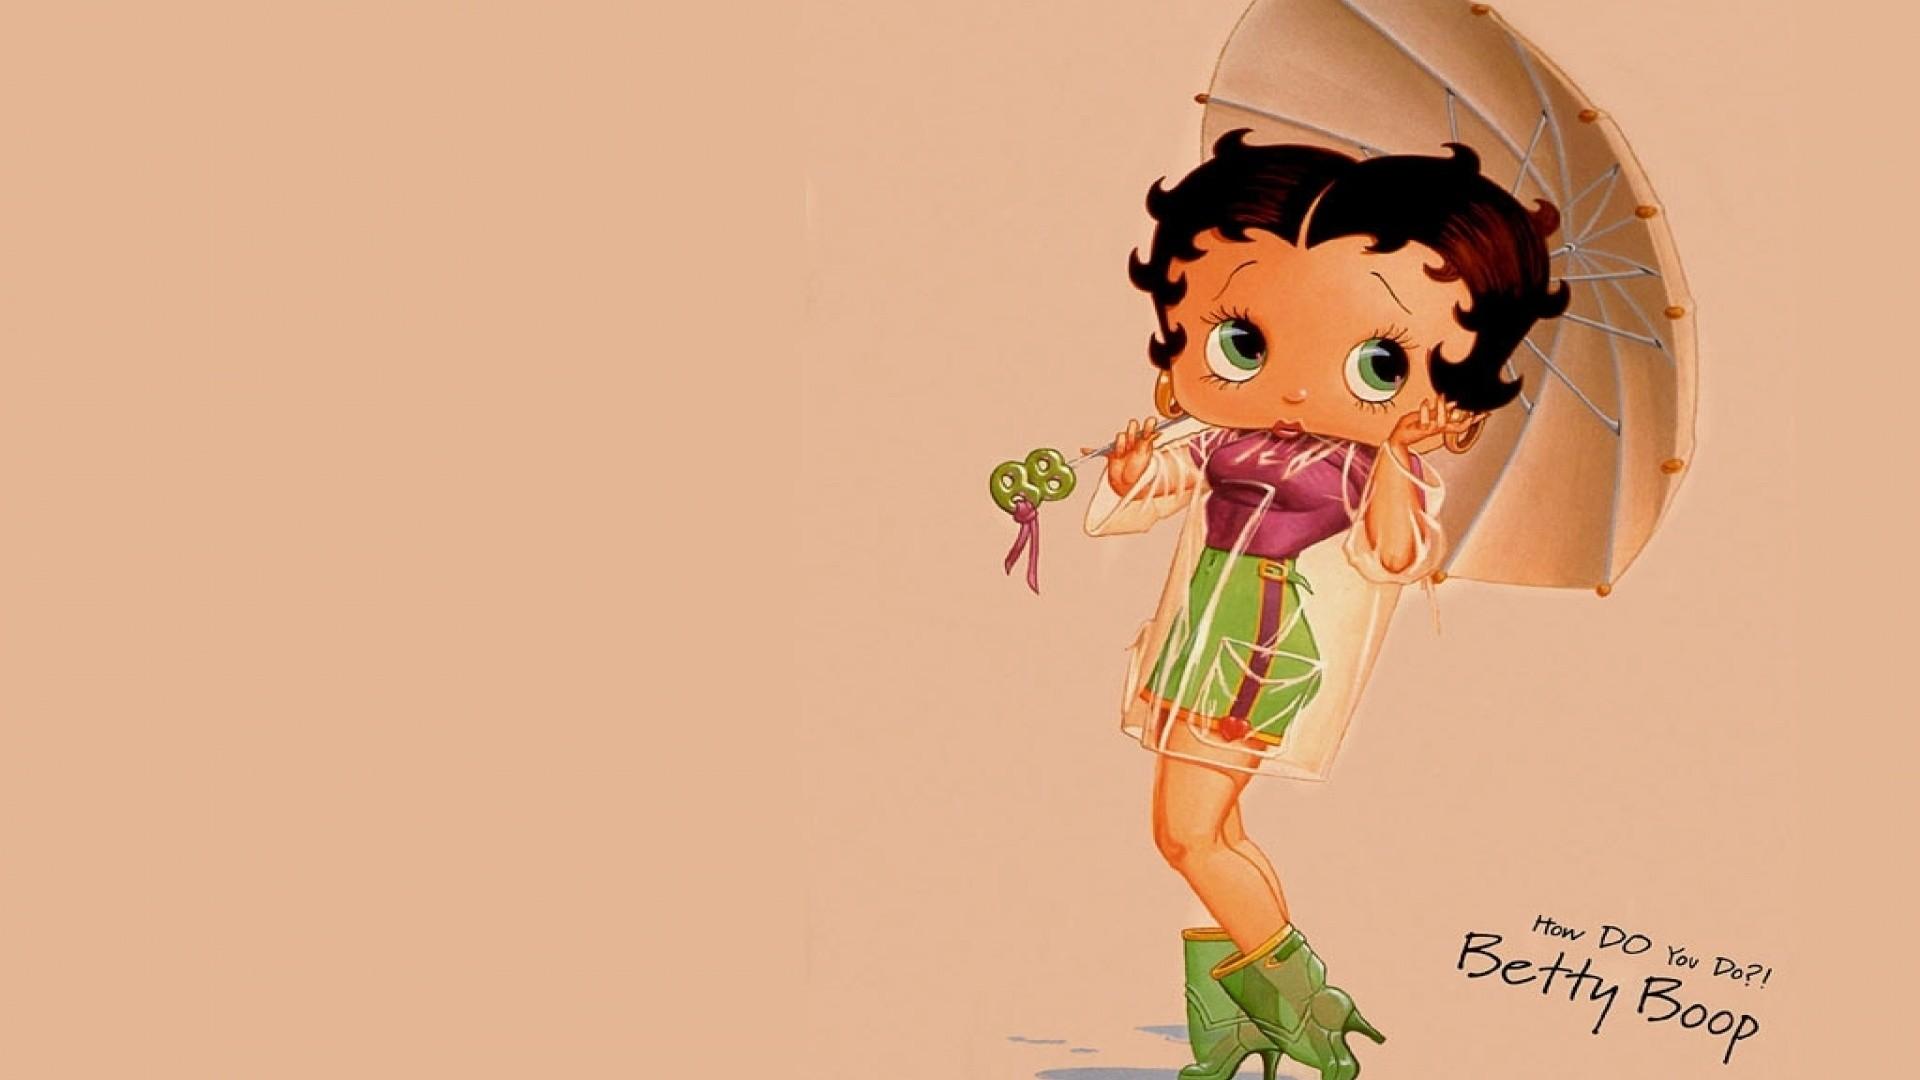 Betty Boop HD Wallpapers ·â'